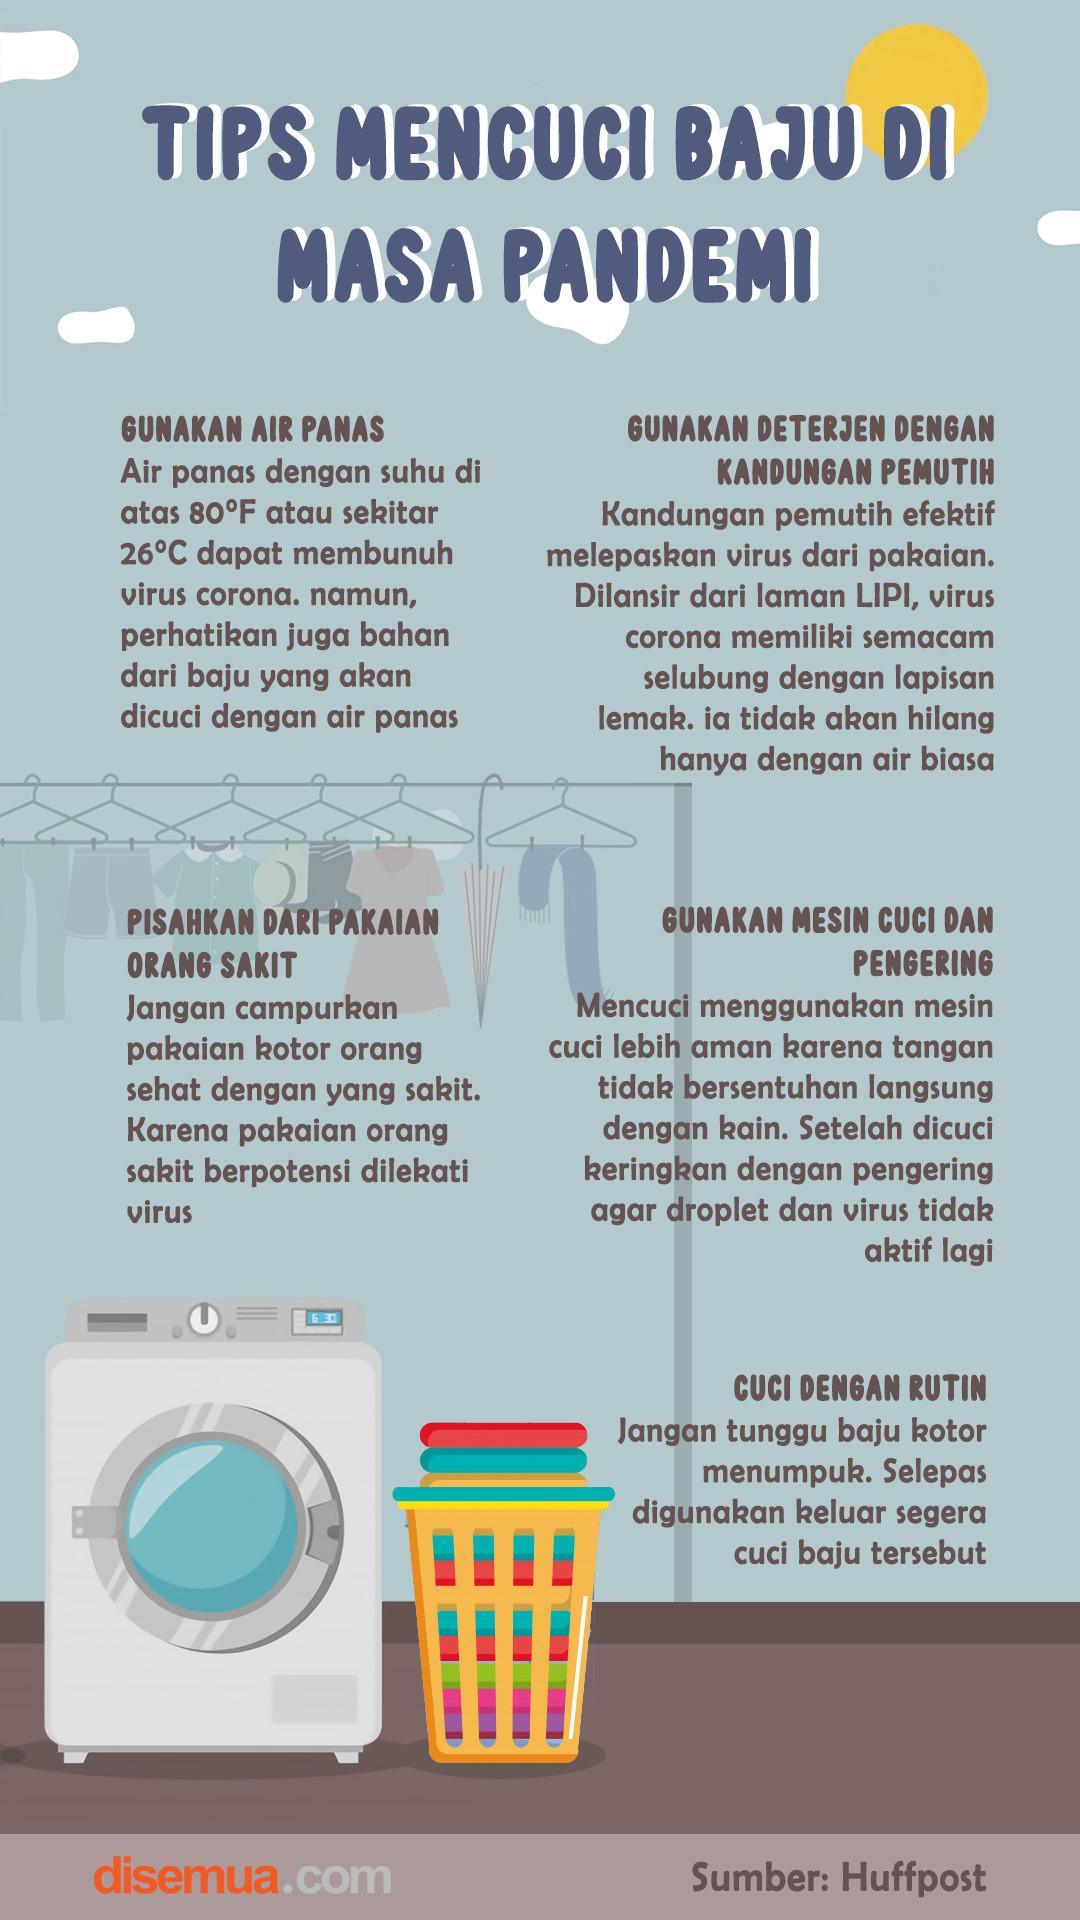 Tips Mencuci Baju di Masa Pandemi